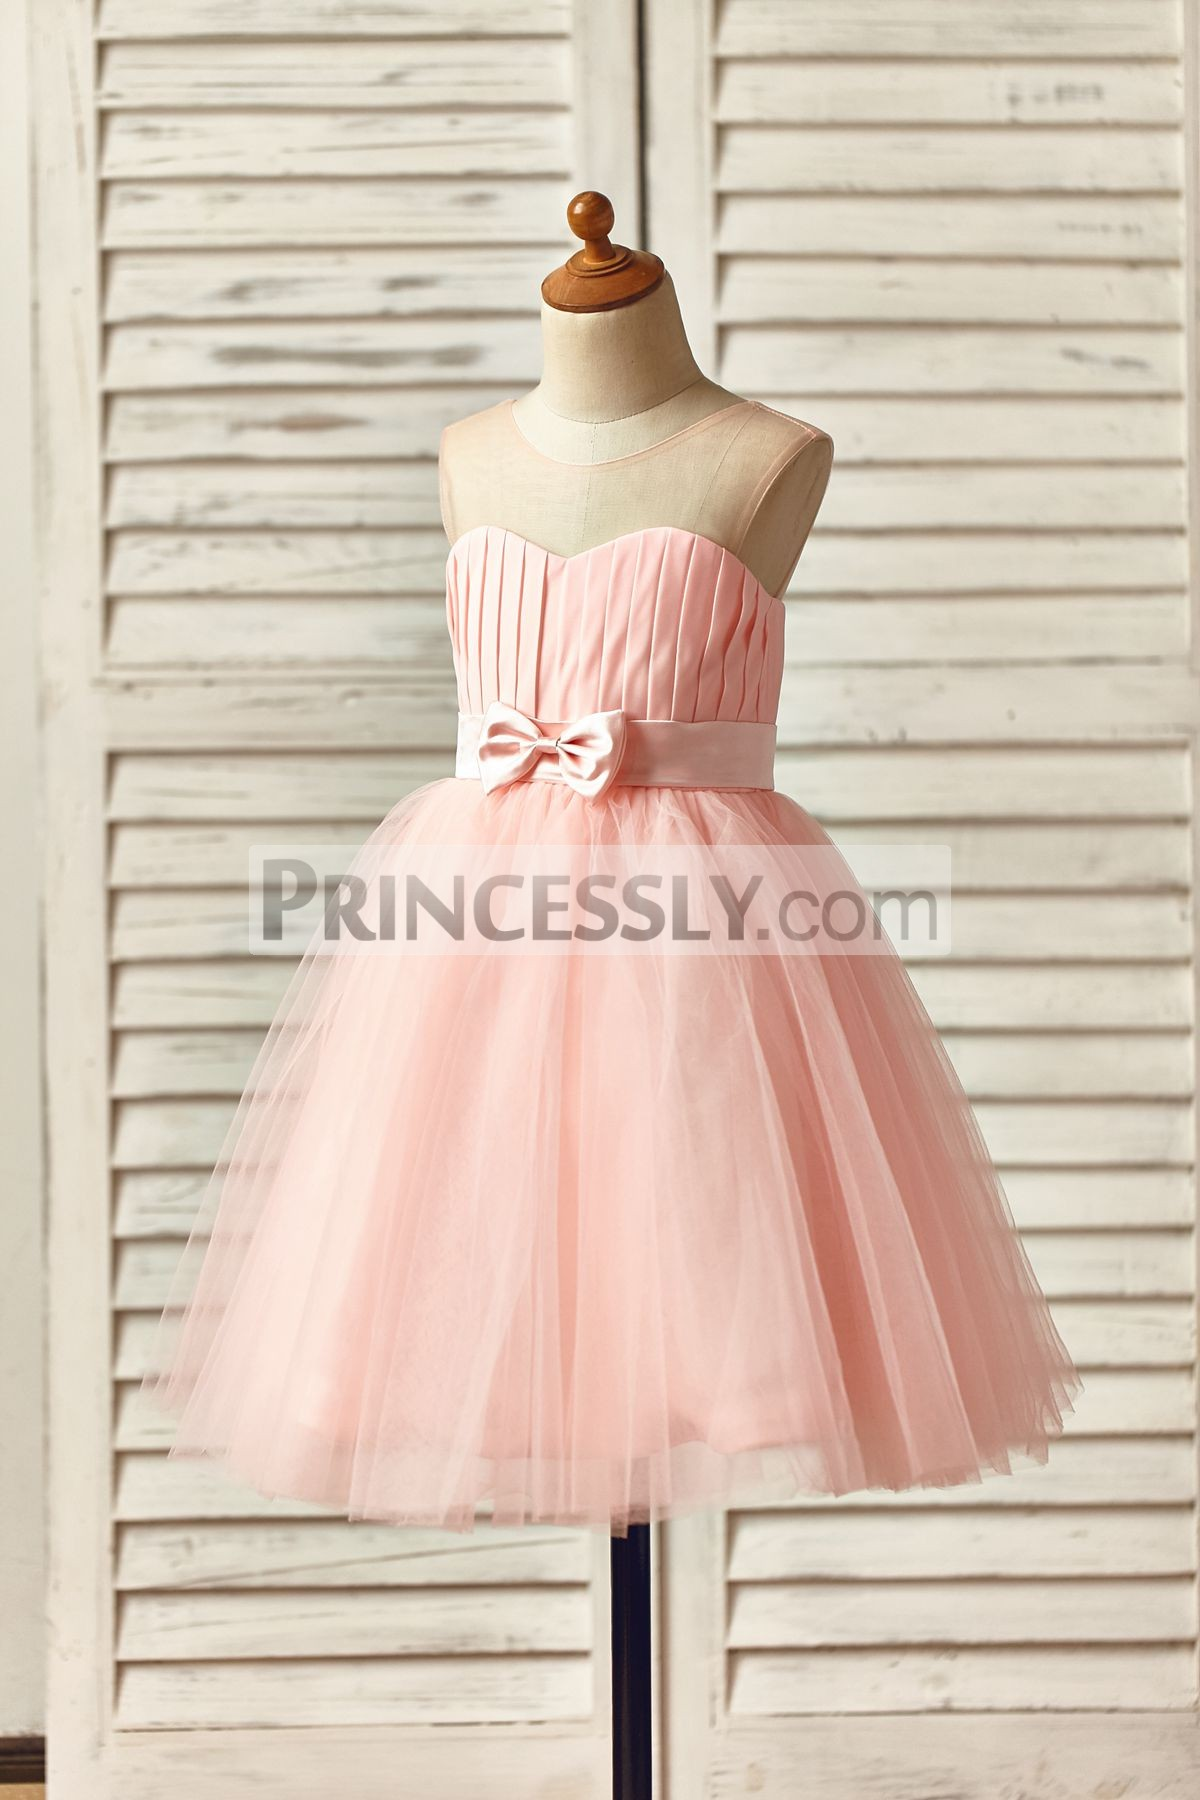 Sleeveless Slightly Ball Gown Princess Baby Girl Dress